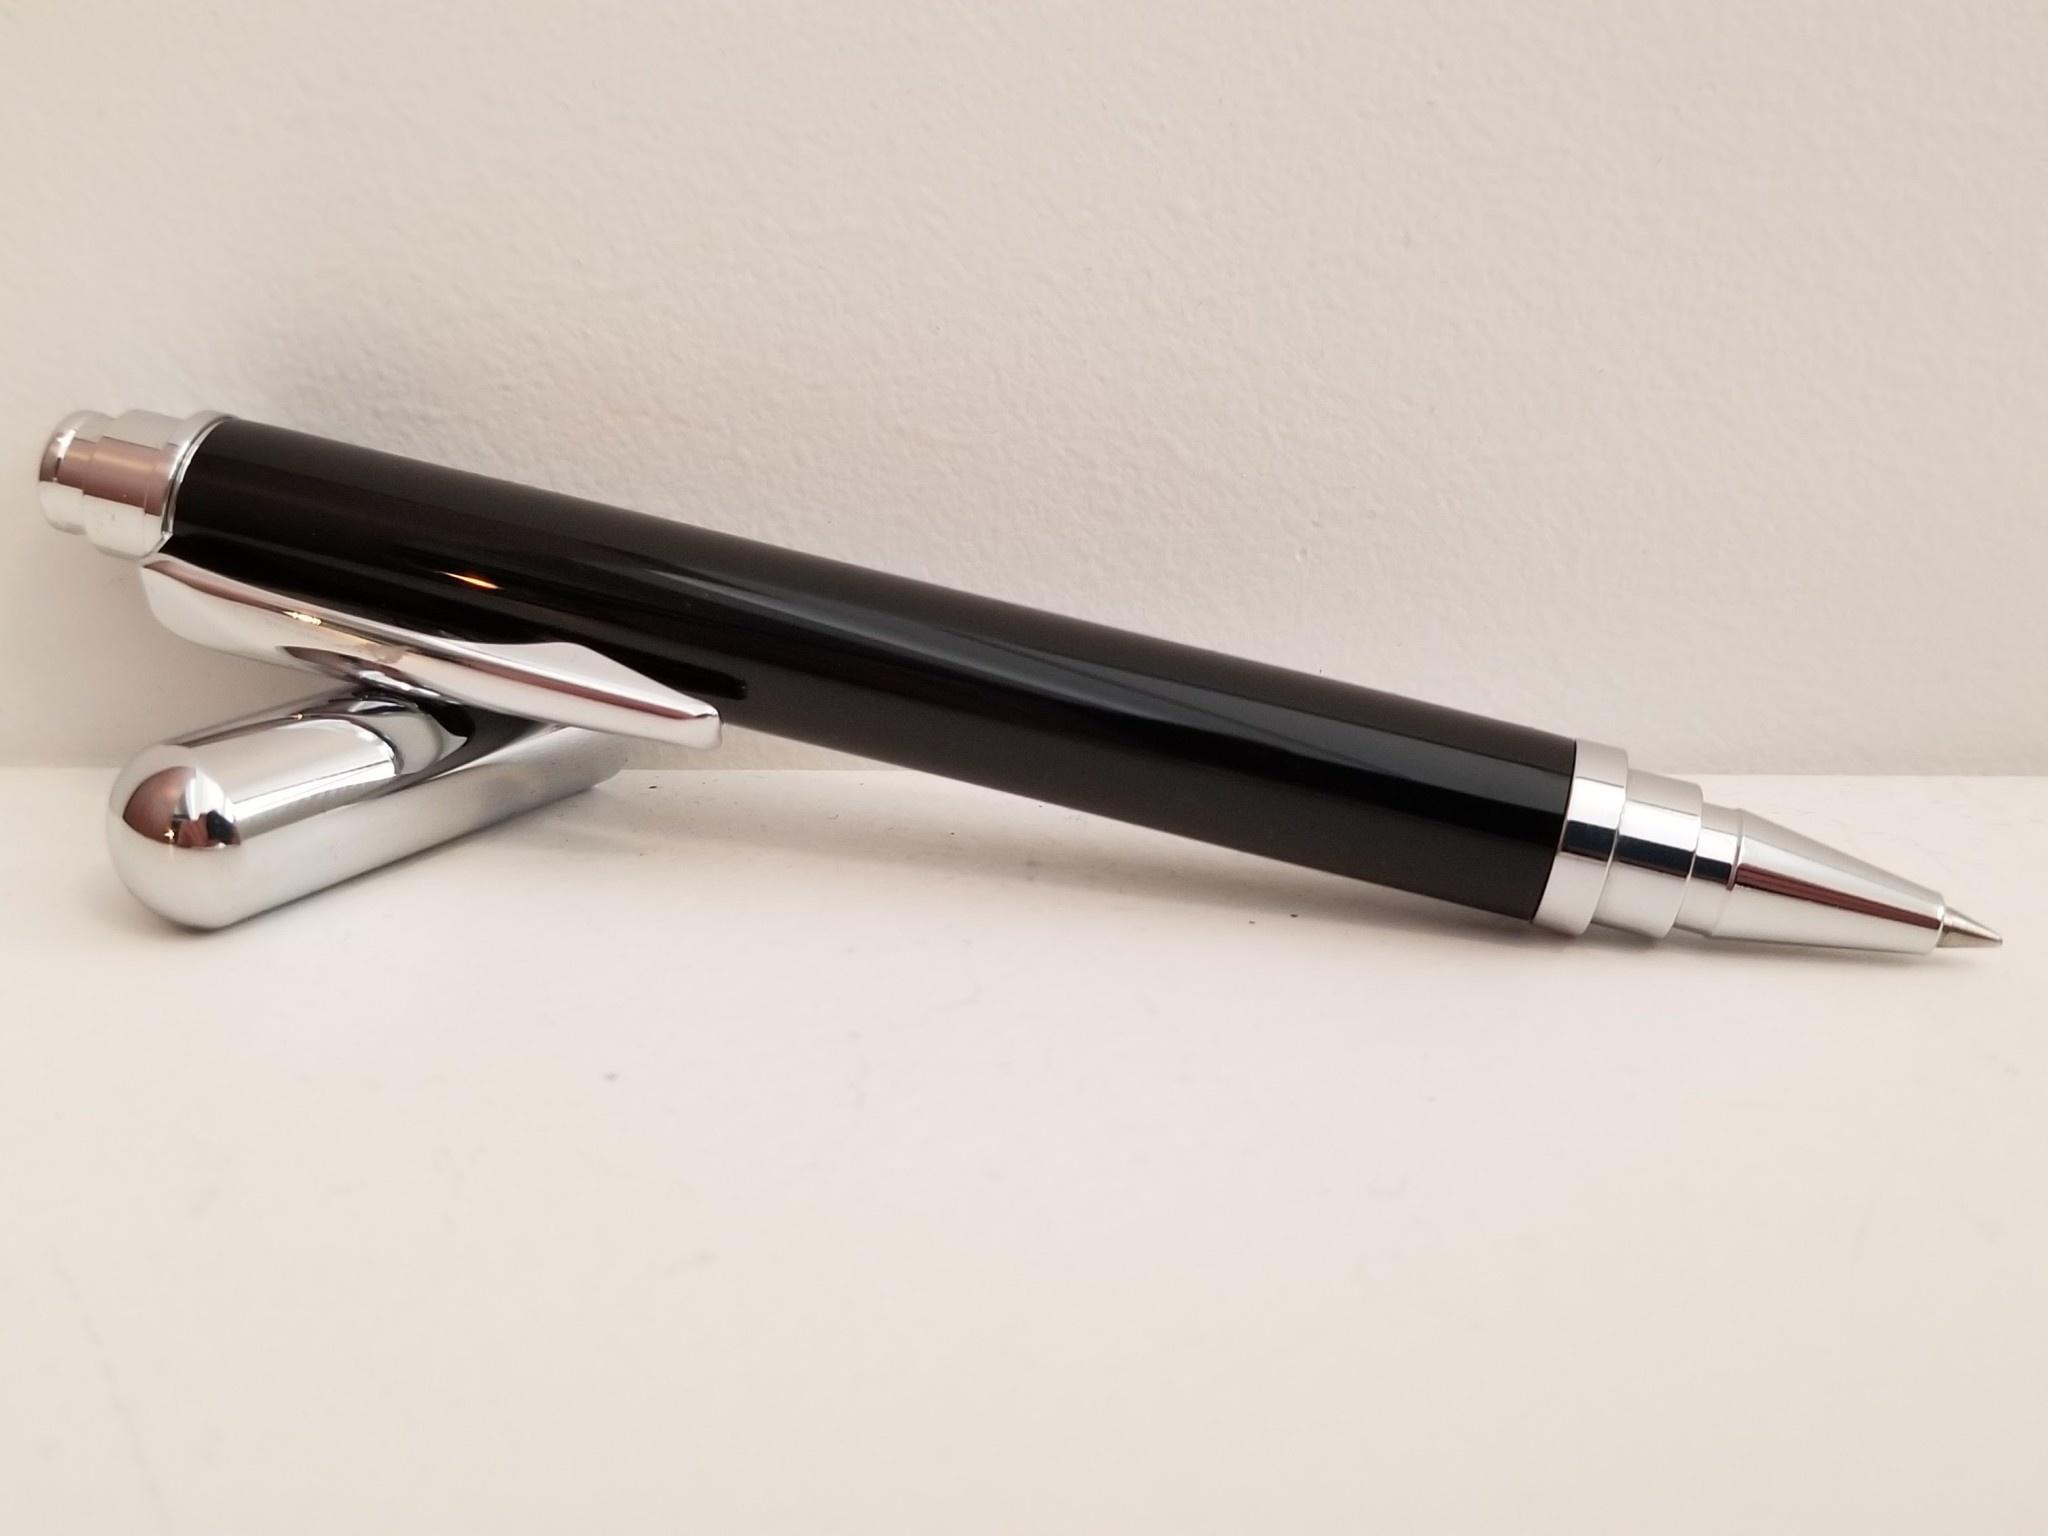 Red Box Pens Rollester Rollerball Pen - Chrome Plate & Onyx Resin